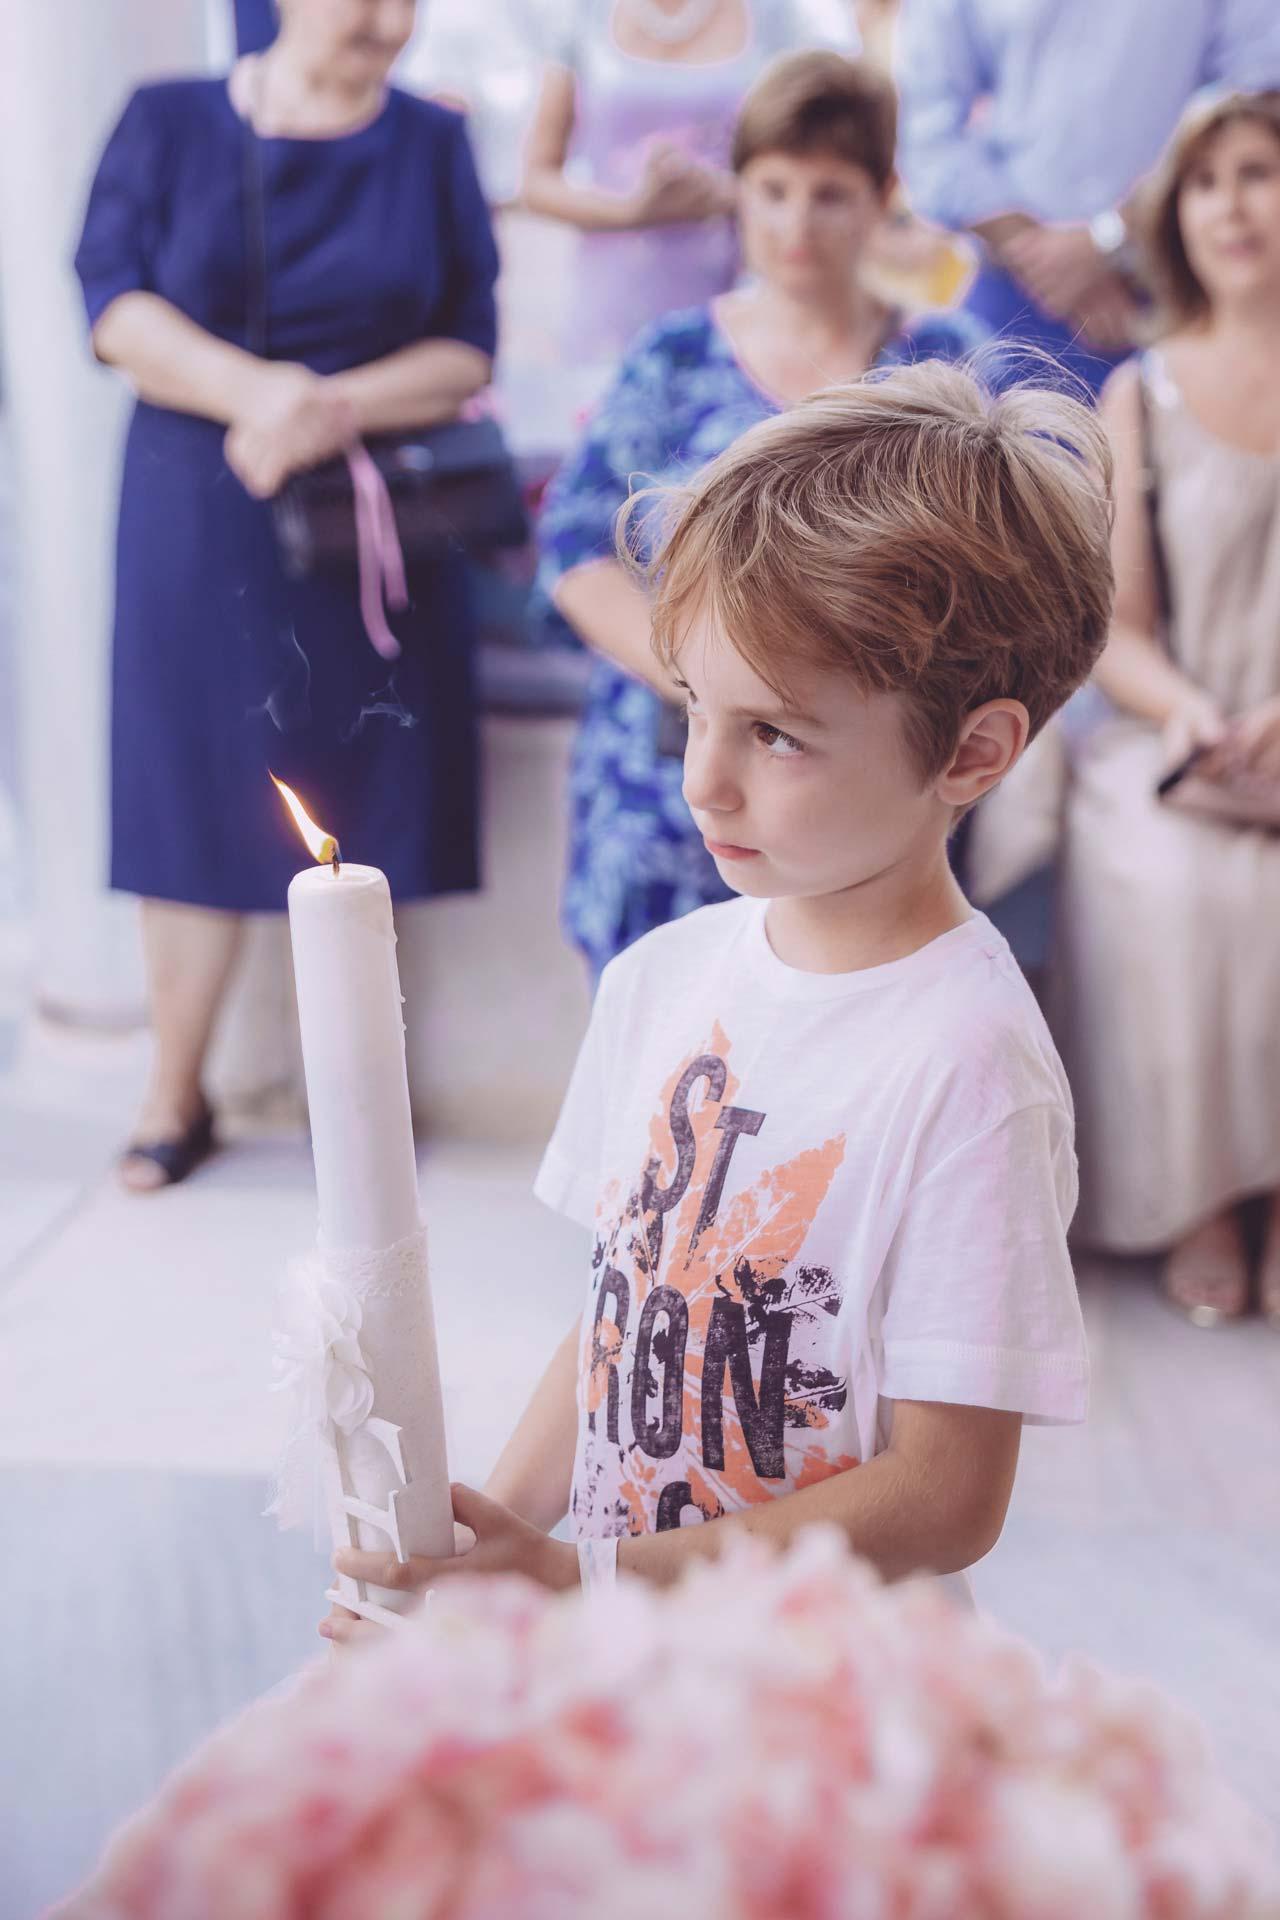 402 PhotoVaptisis βαπτιση σπετσεσ φωτογραφοσ vaptisi koritsi agios nikolaos spestes island photographer